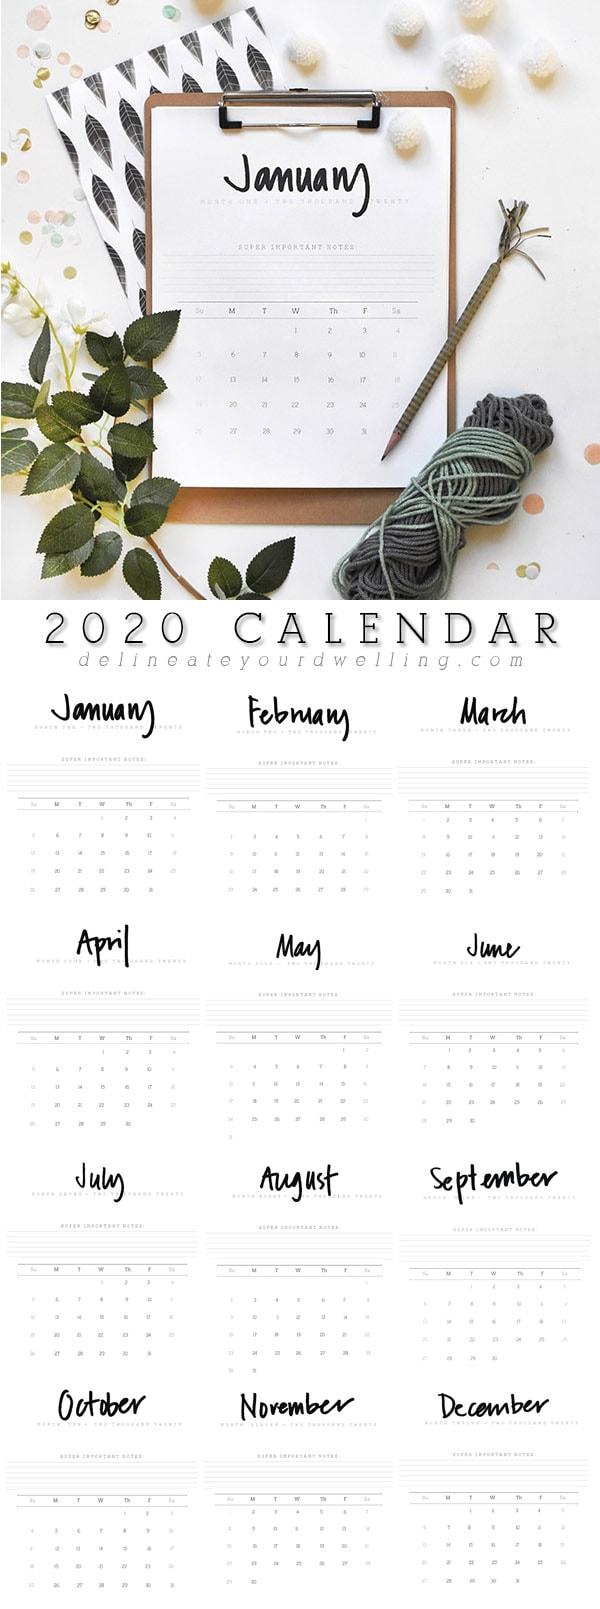 2020 Printable FREE Hand Lettered Calendar